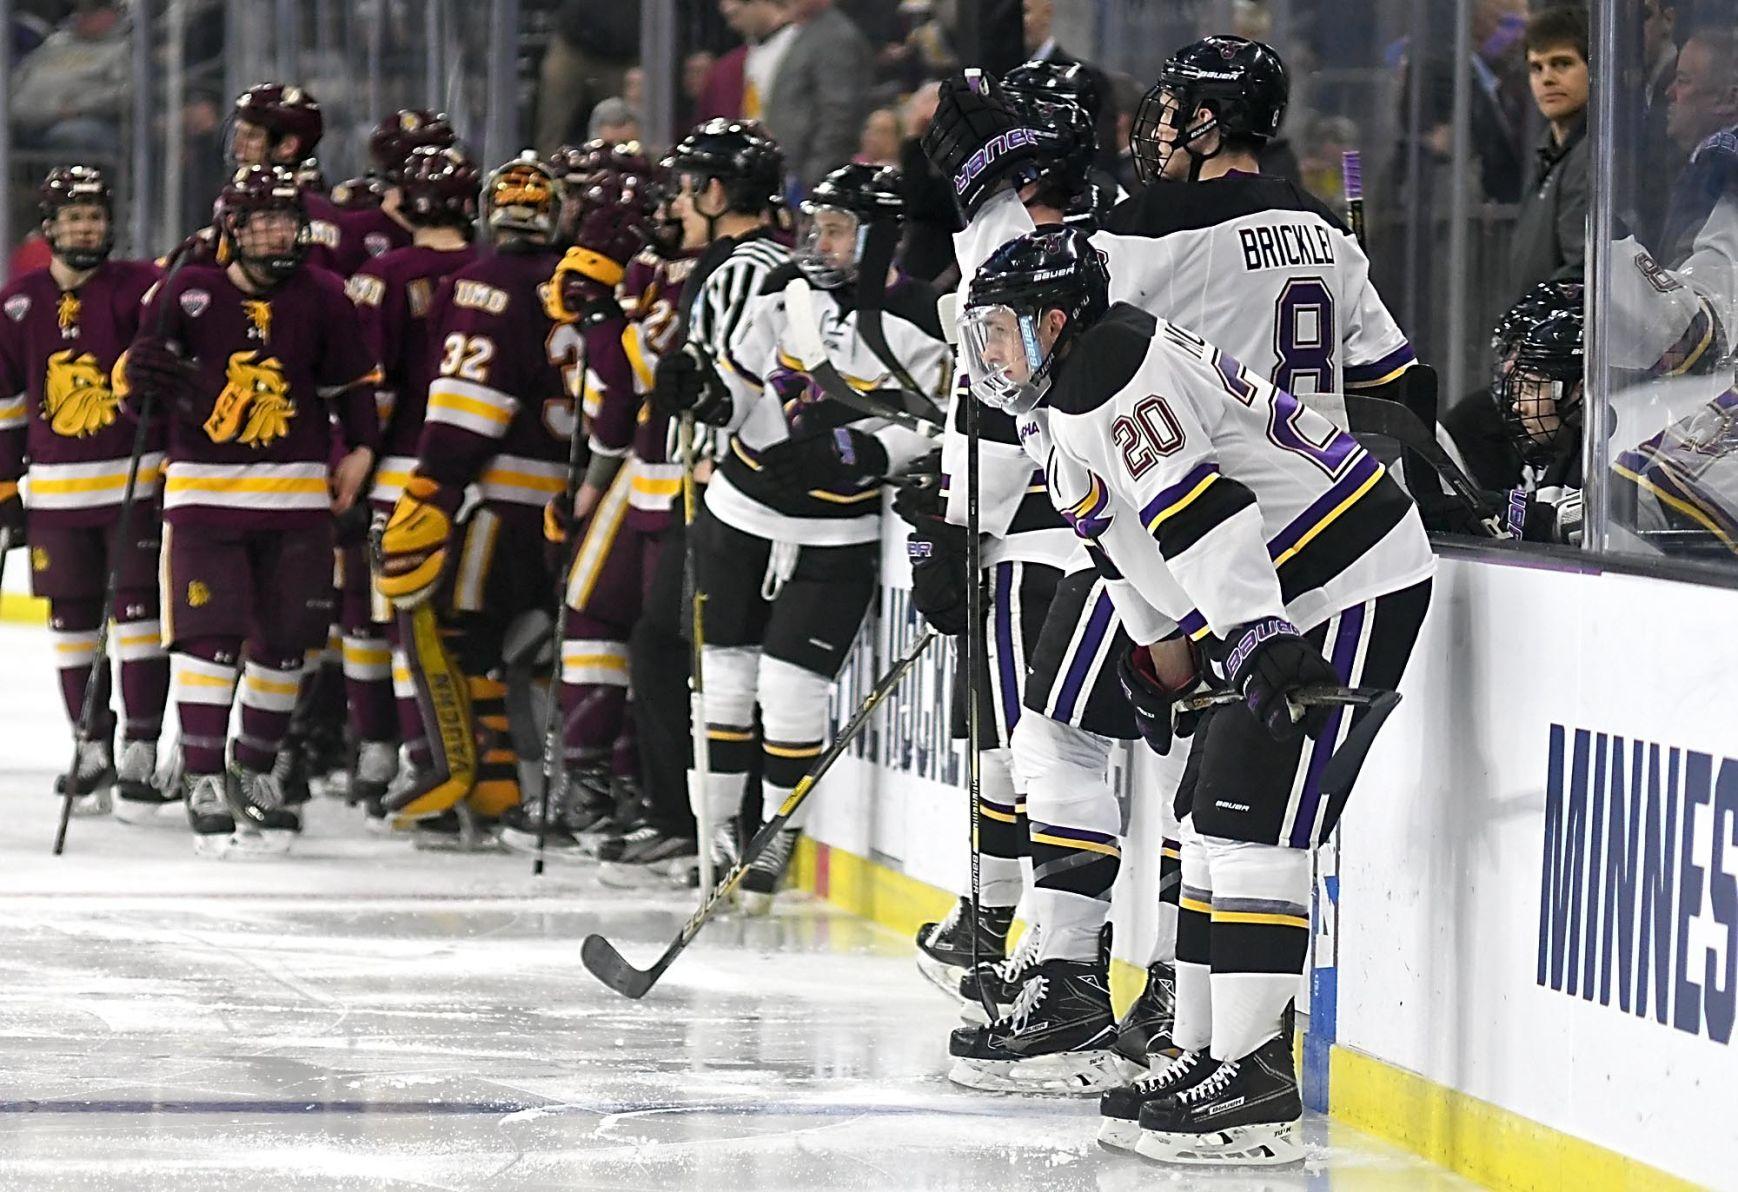 WCHA: MSU Mavericks Turn Page To New Season | MSU Men's Hockey | Mankatofreepress.com